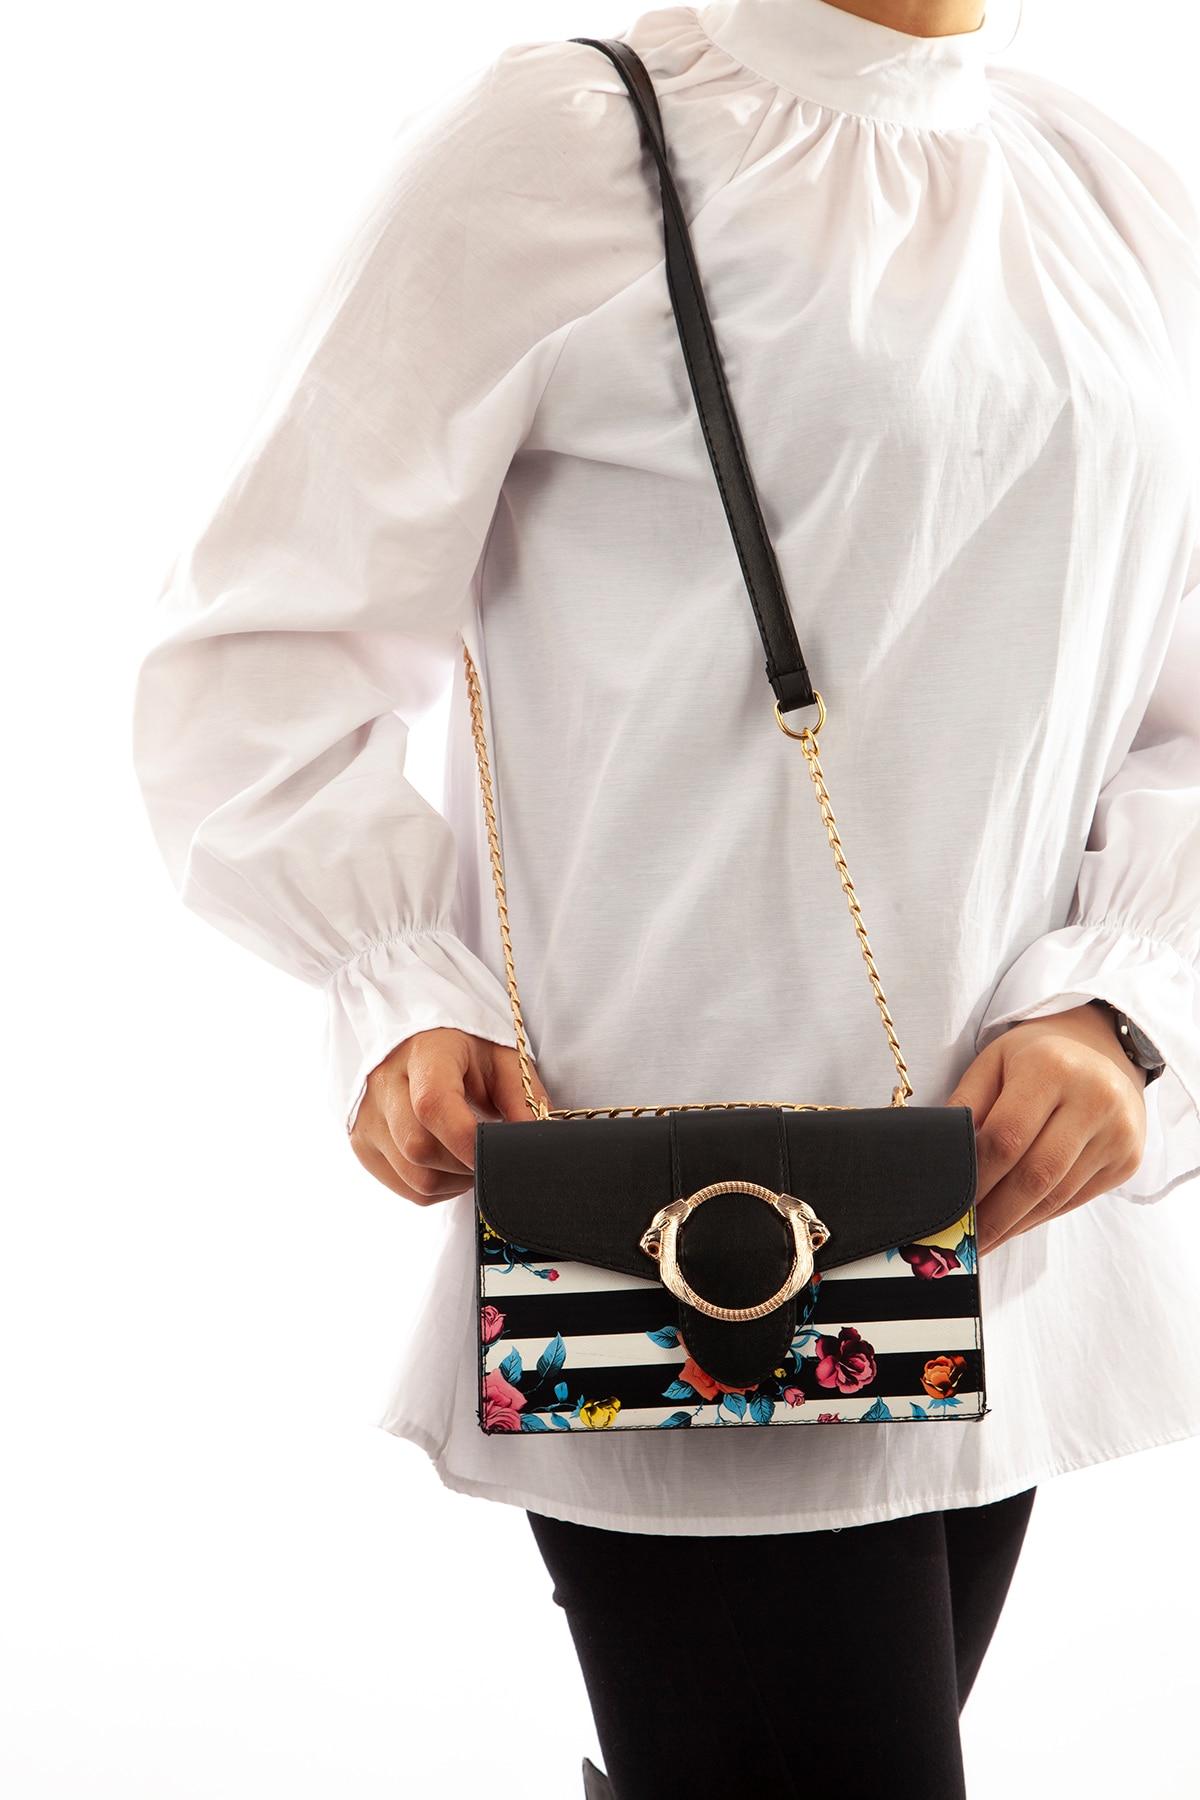 Ardanewline Women 'S Handbag 1084008-13